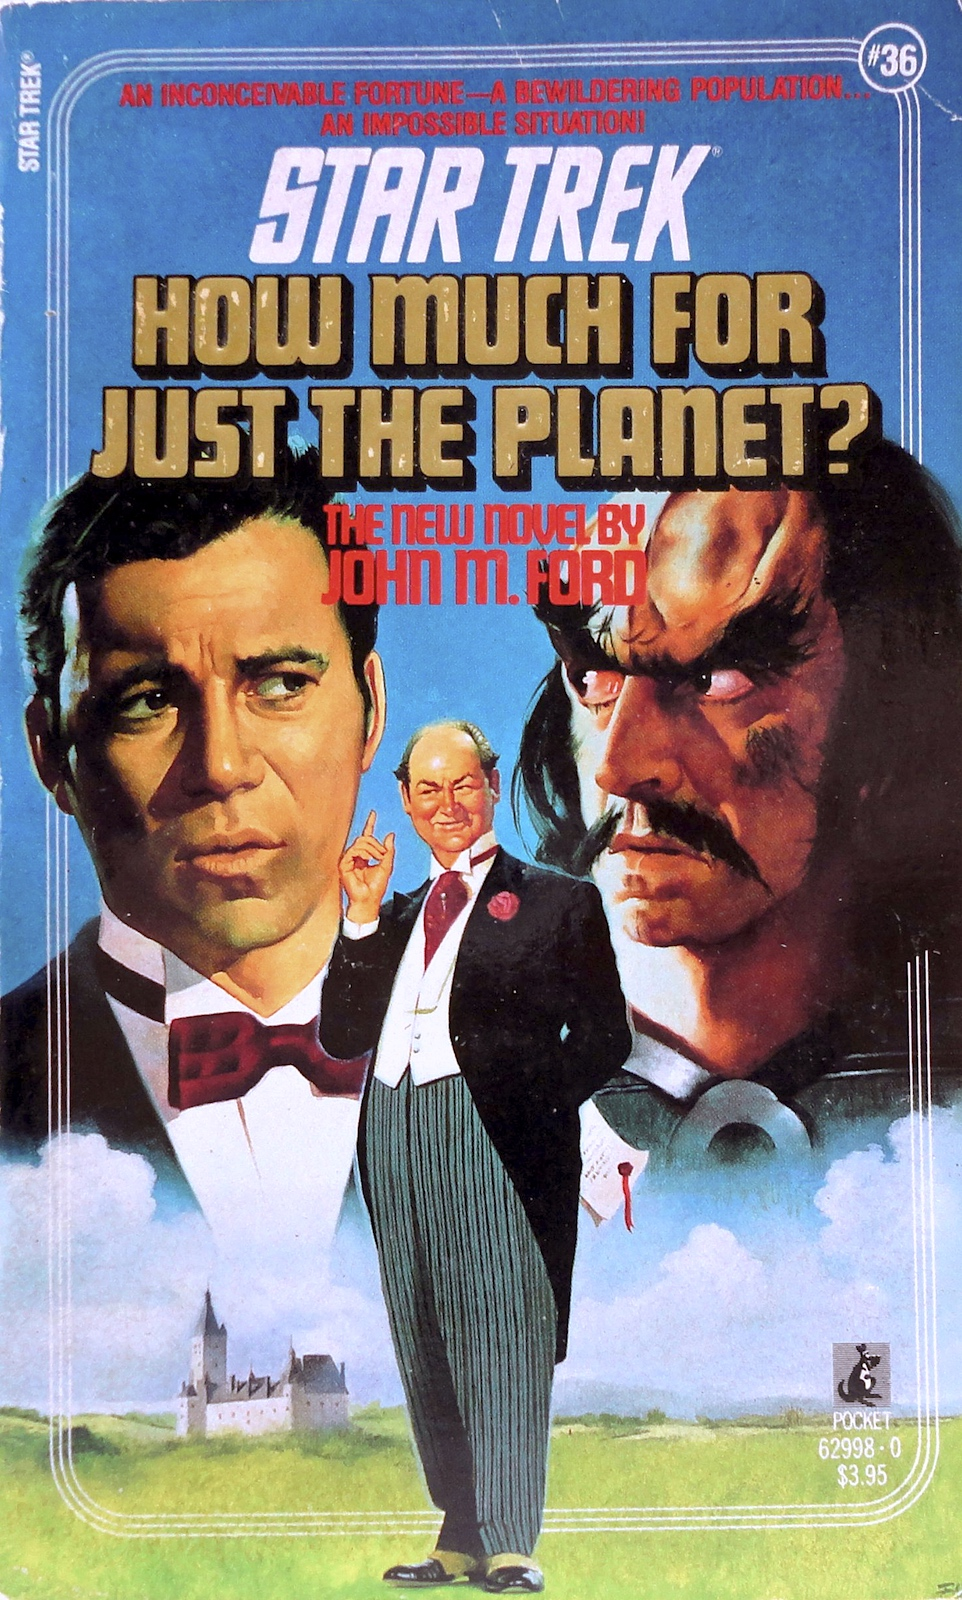 File:JustThe Planet.jpg